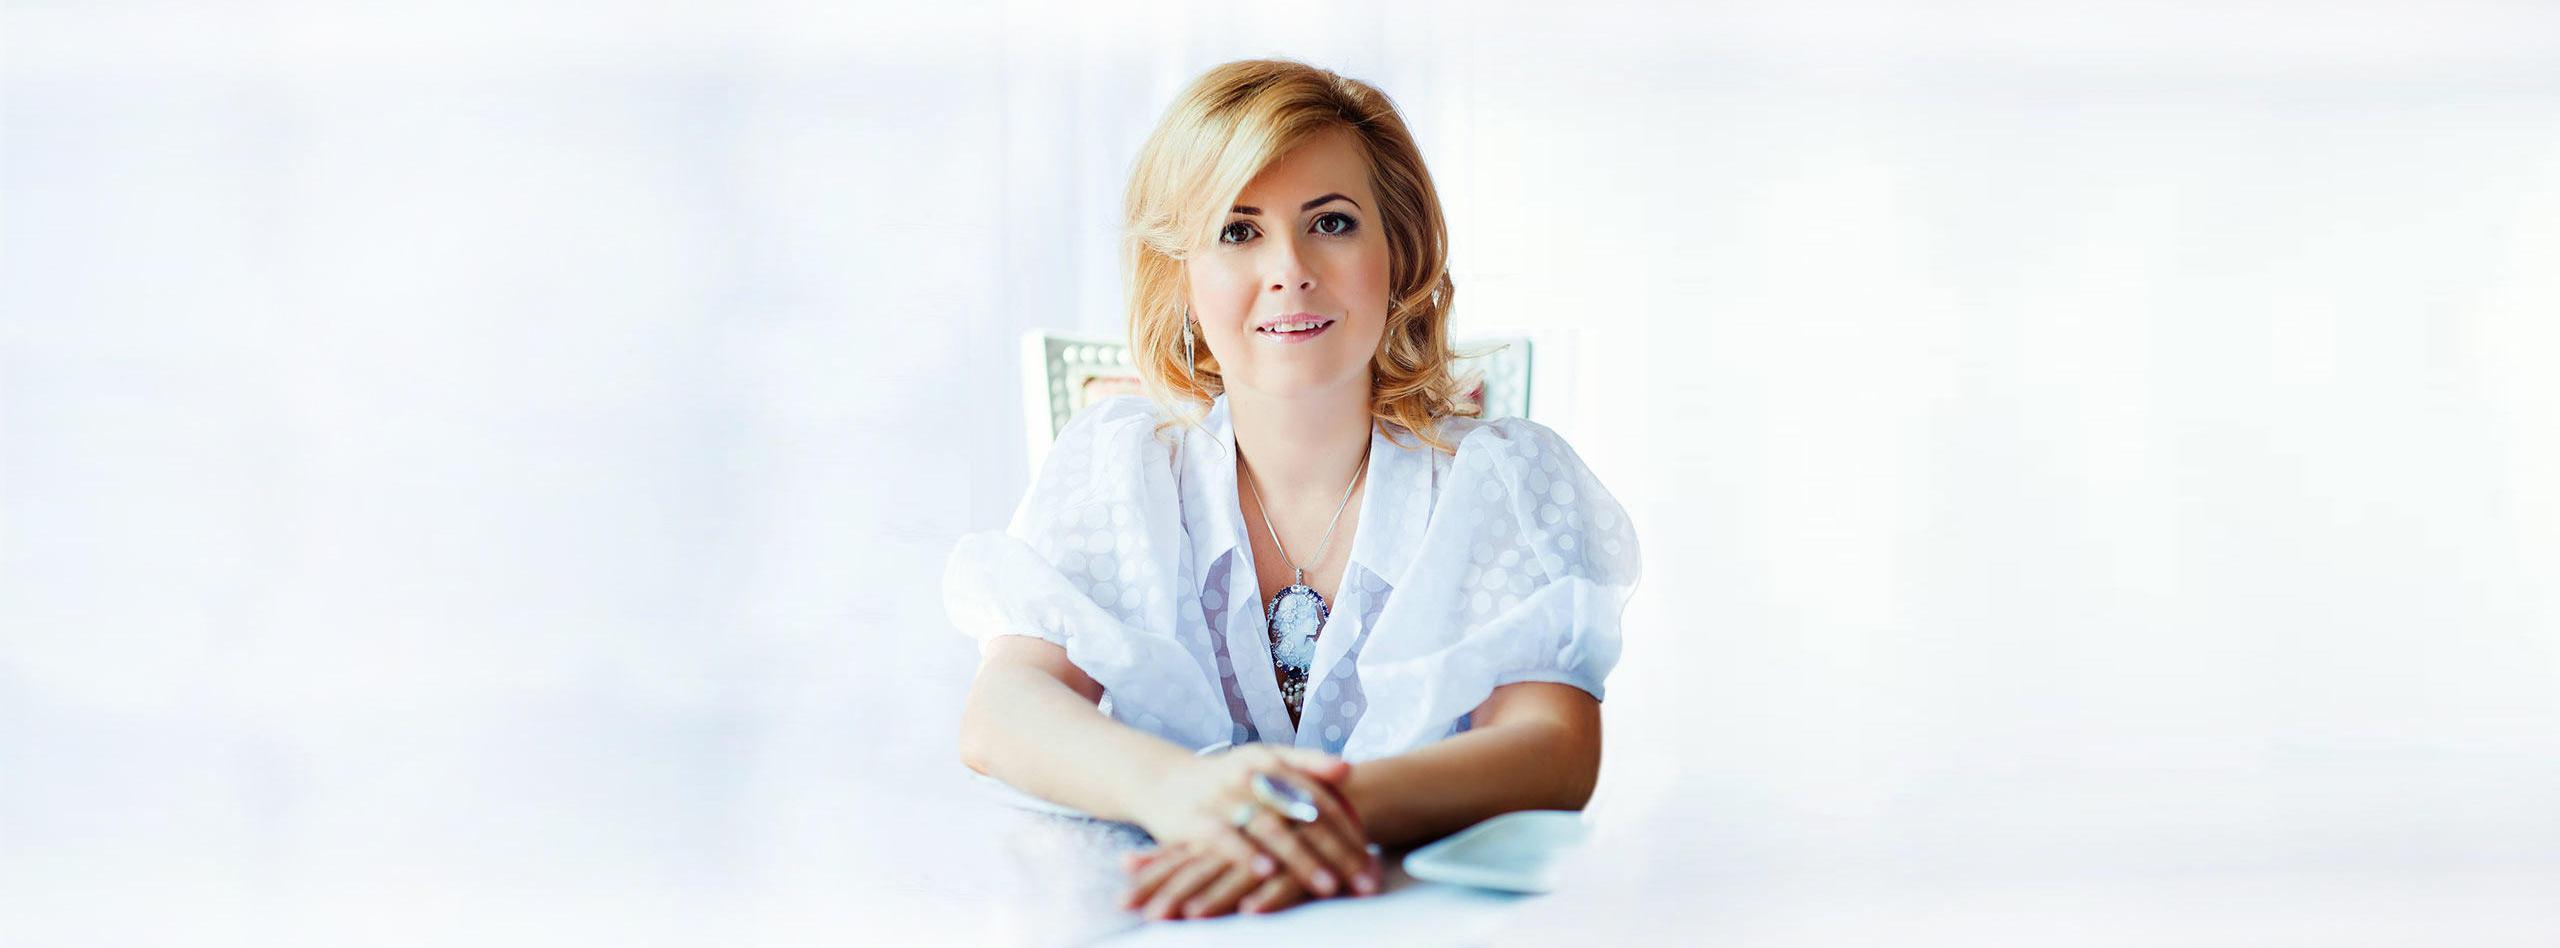 Елена Деревянко